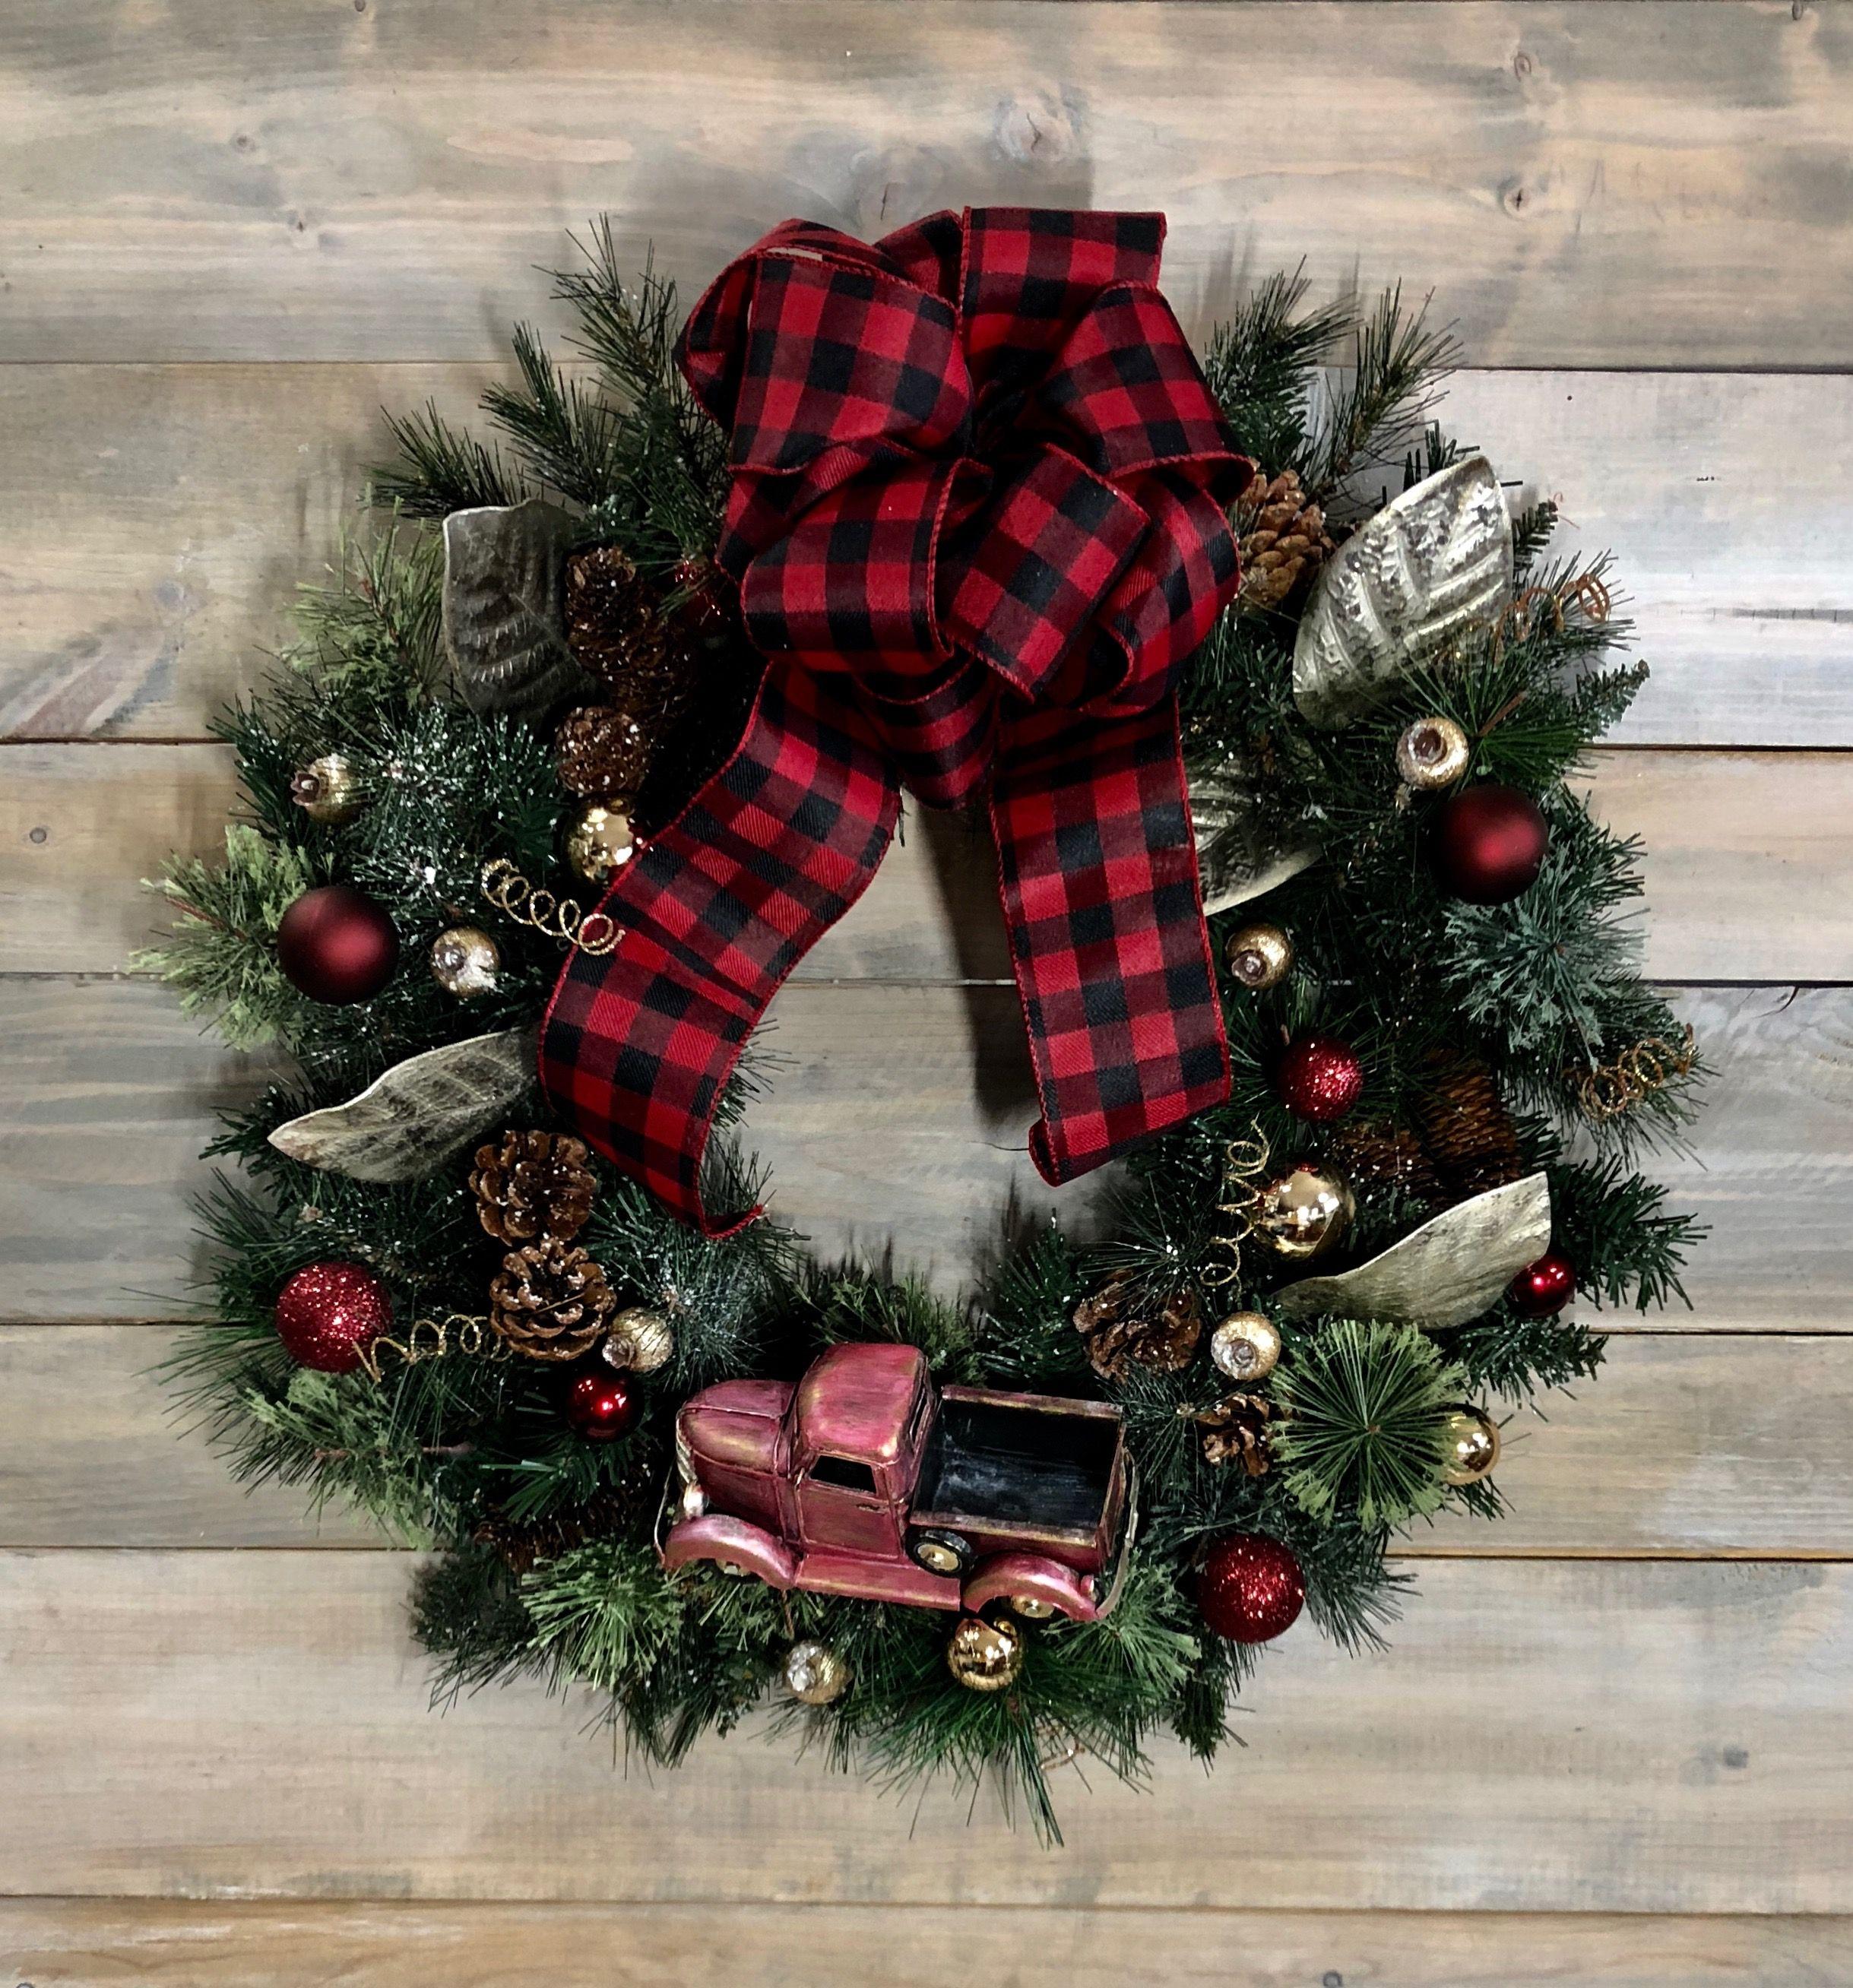 Xl Vintage Red Christmas Wreath Etsy Com Shop Celebrationsdesignco Free Shipping High Demand